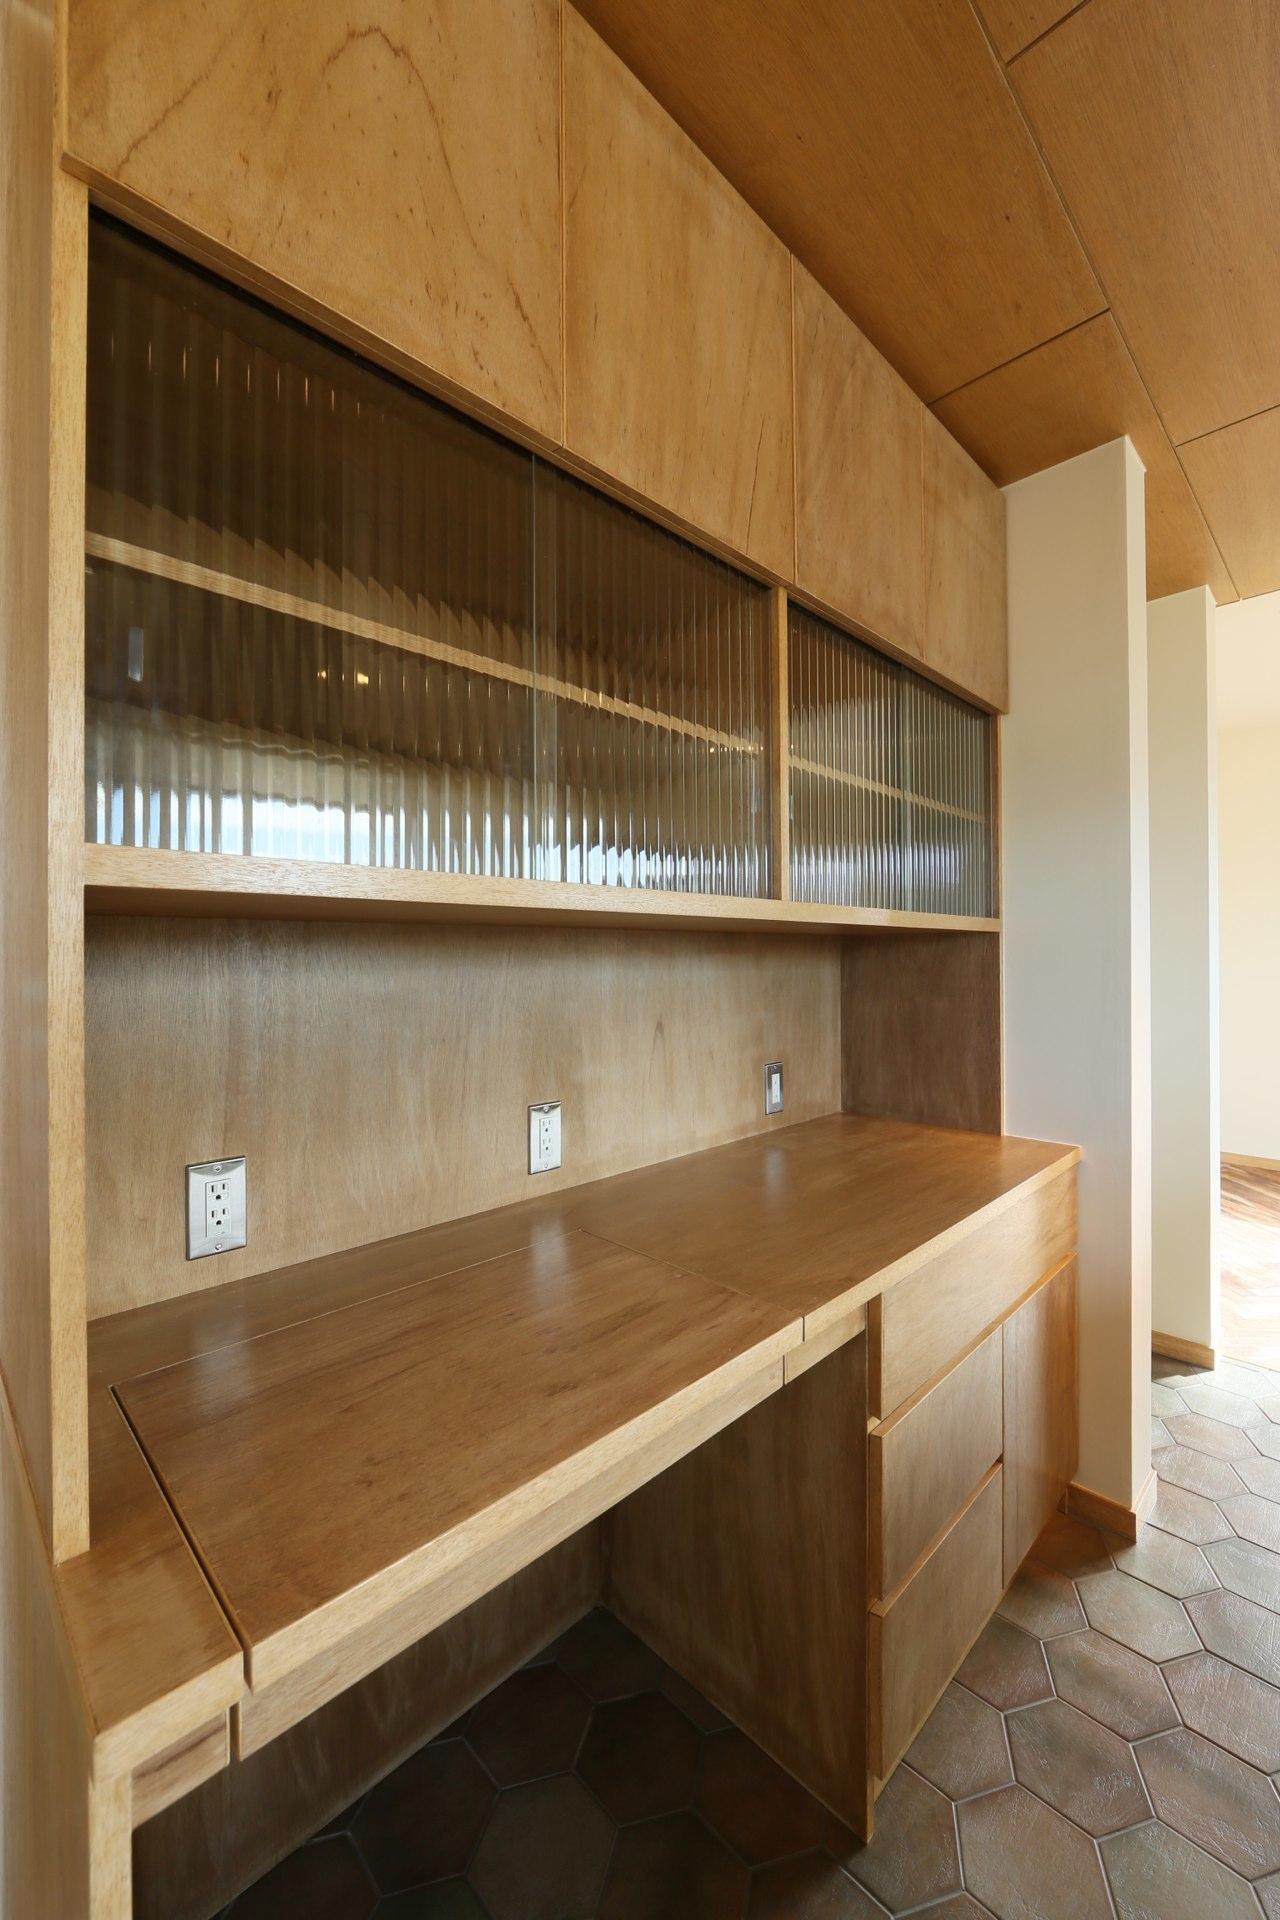 Y's residenceの写真 キッチン作業スペース